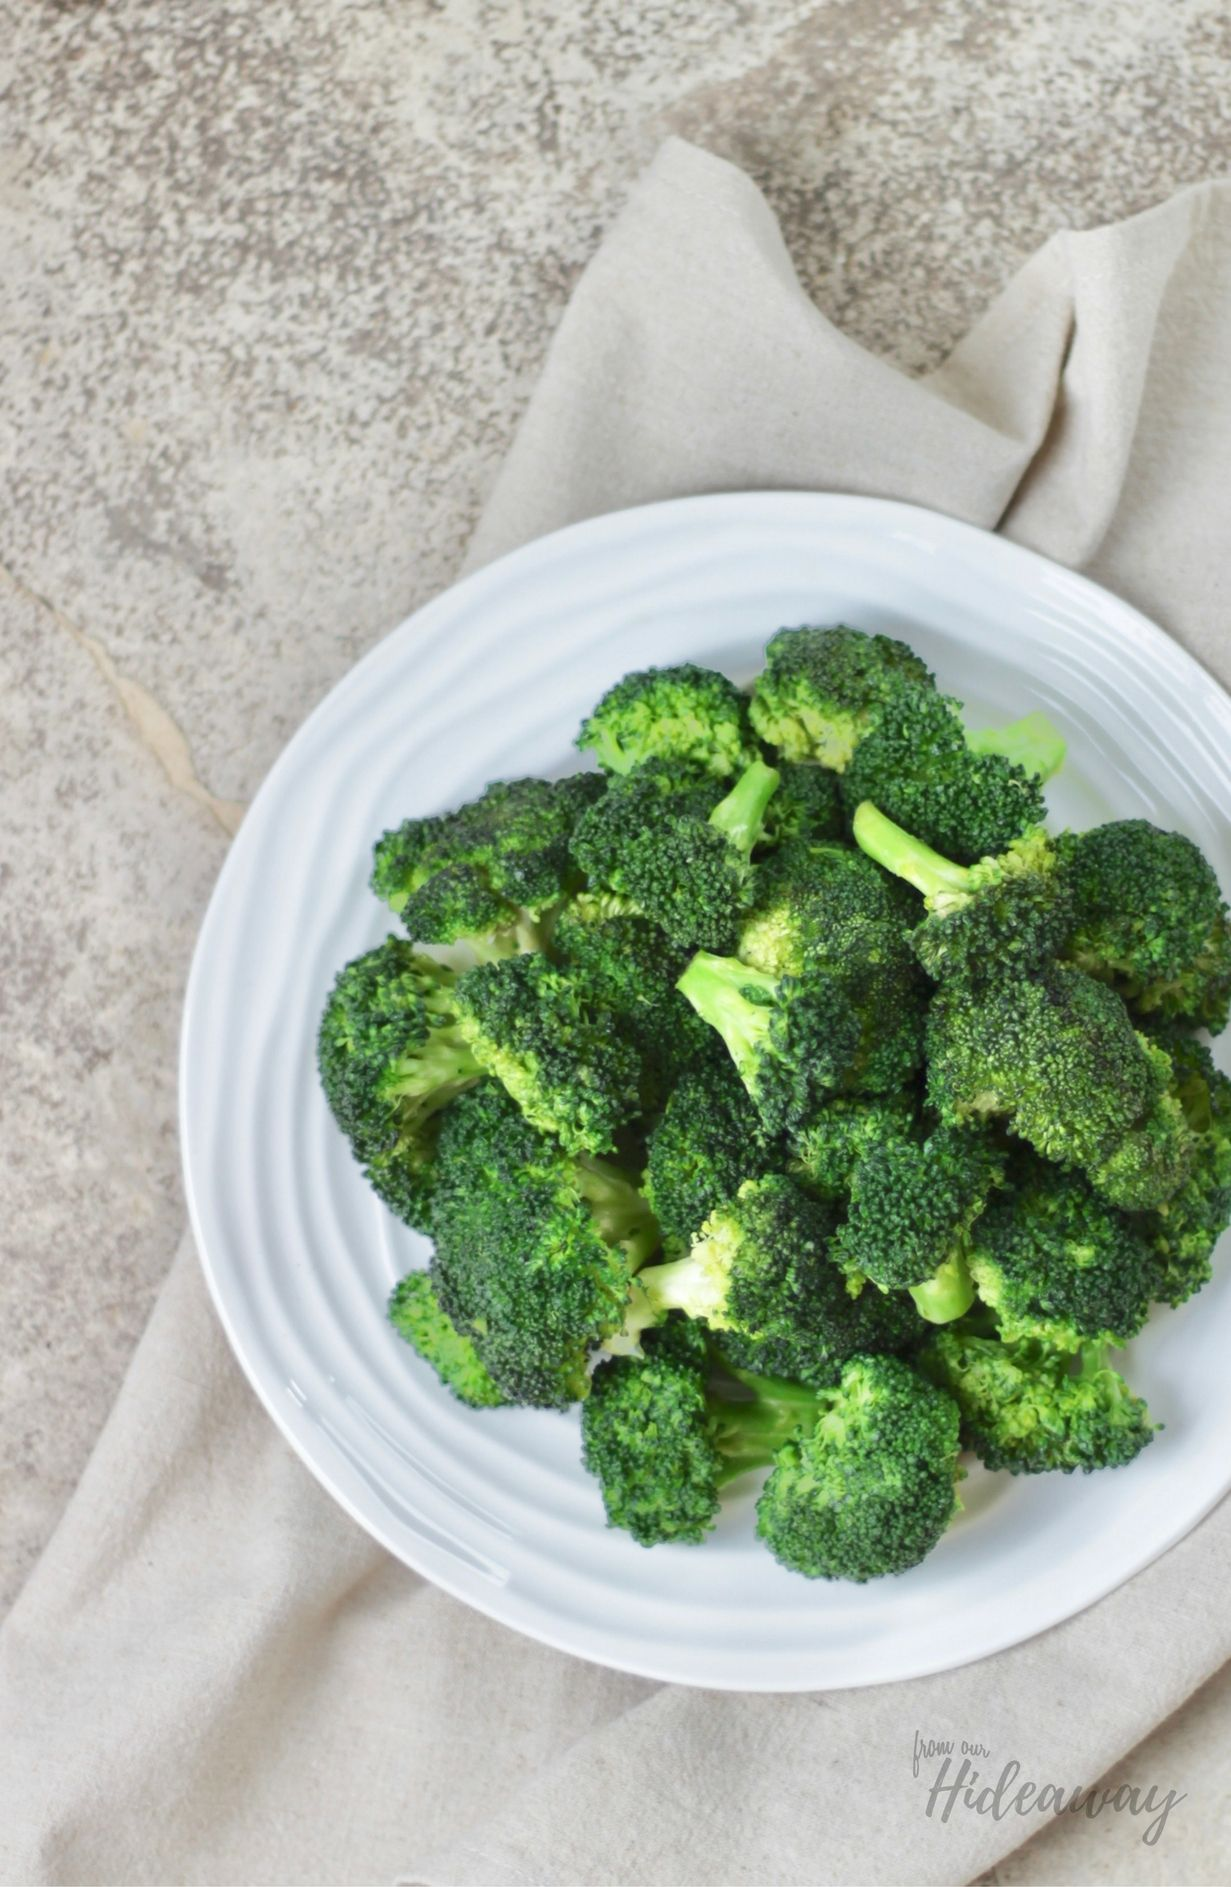 Easy Broccoli Recipe FromOurHideaway.com